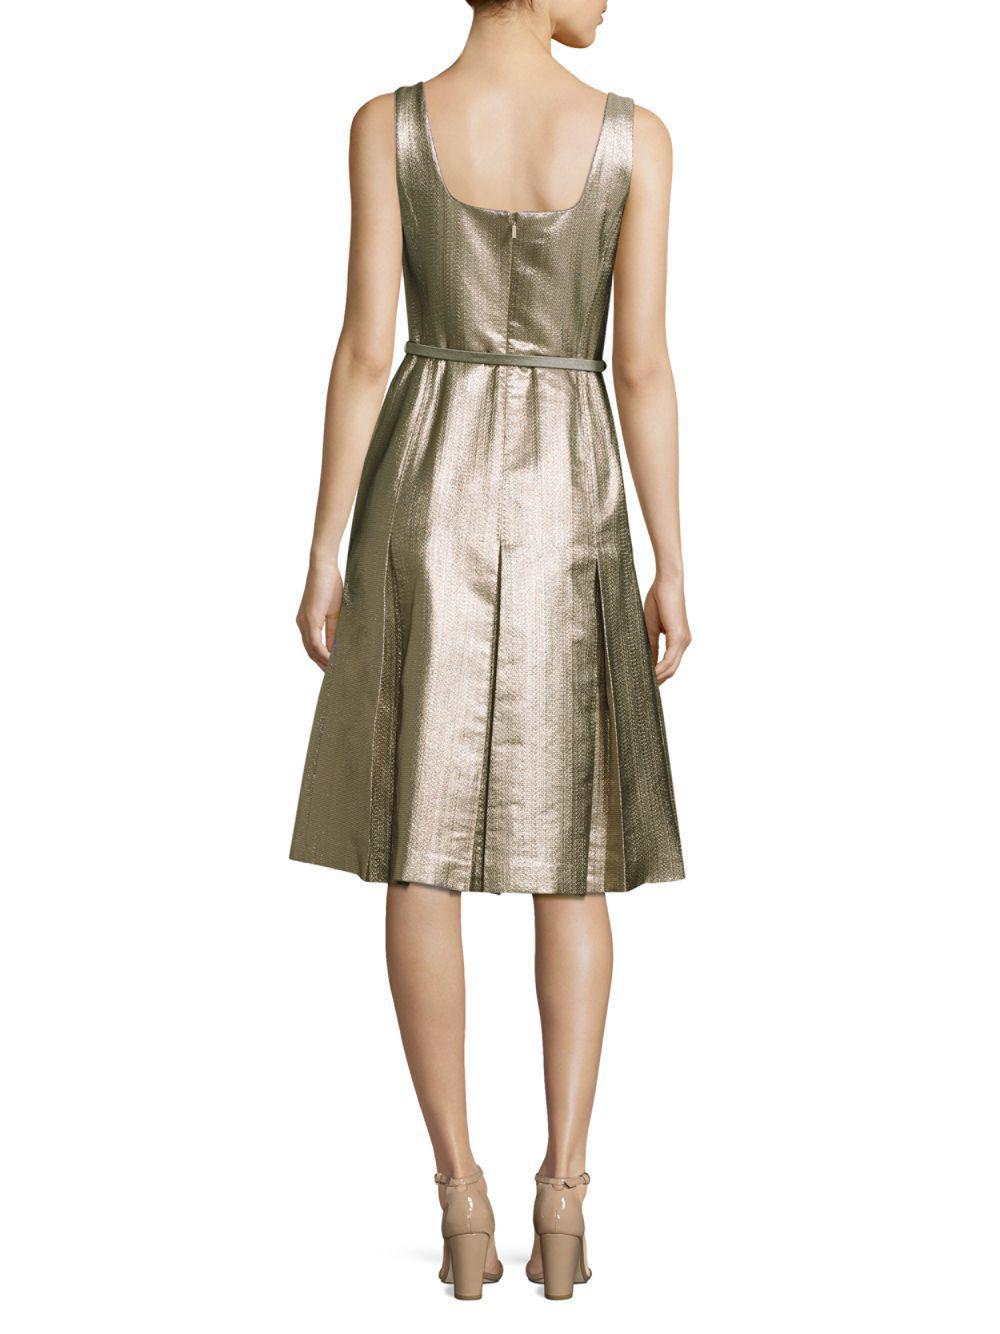 e8812a38dd34 Lafayette 148 New York Lois Metallic A-line Dress in Metallic - Save 33% -  Lyst